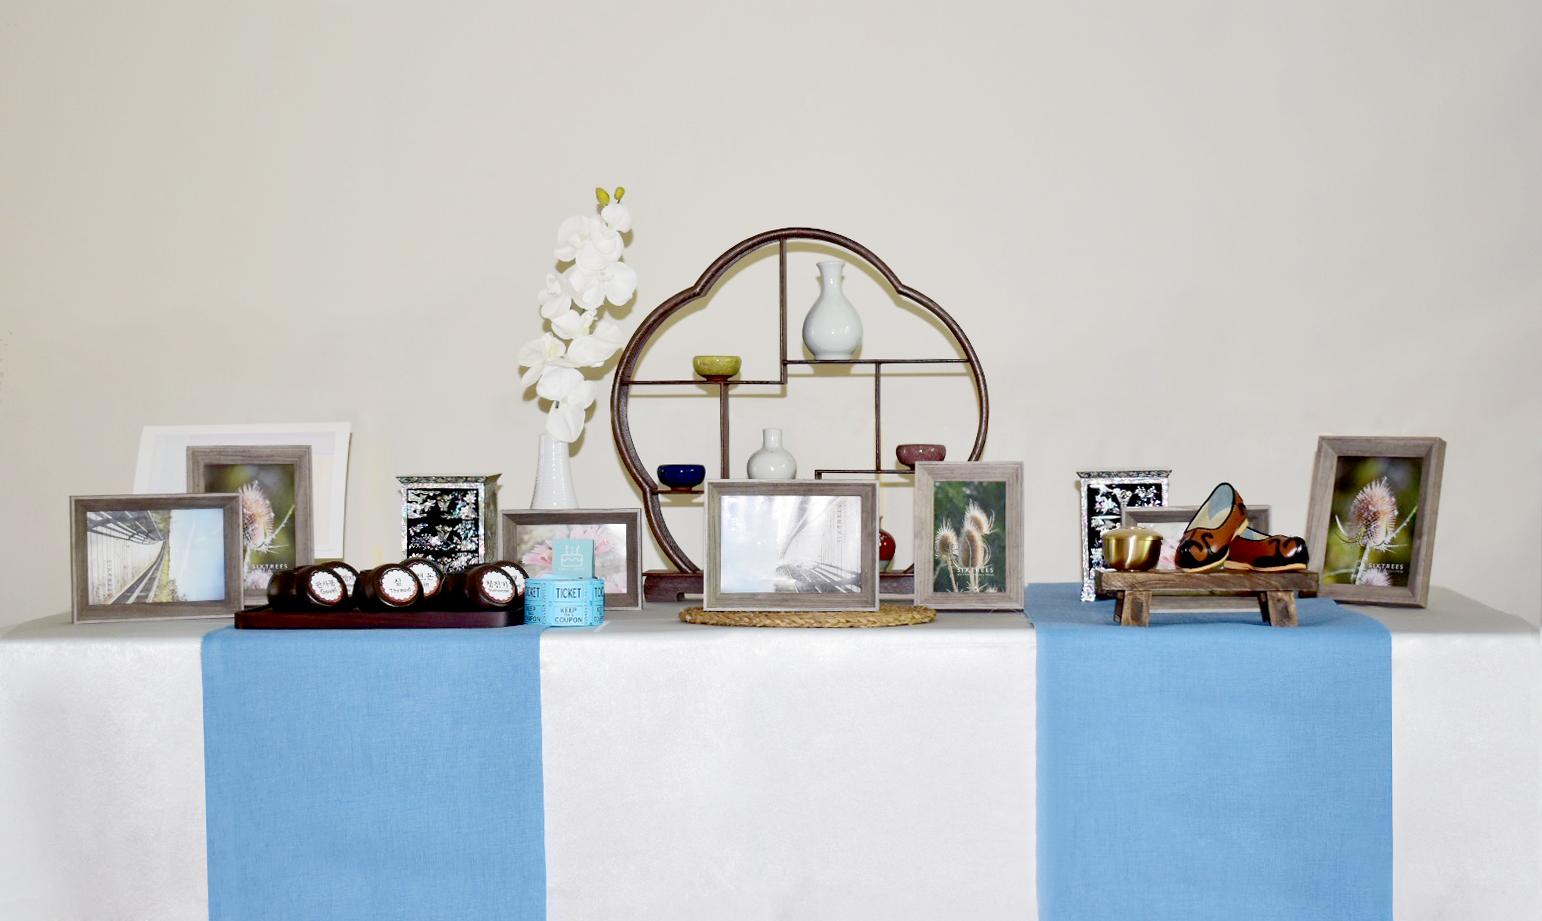 Traditional photo table #2 - Included: Traditional accessories rack, 4 picture frames(5x7), 2 picture frames(4x6), traditional drawers, traditional shoes, 6 Doljabi traditional jars, mini wooden tray, flowers and vase.상품구성: 전통 장식장, 액자 5x7 4개, 액자 4x6 2개, 전통 화병과 찻잔, 전통 신발, 돌잡이 항아리6개, 모시 러너, 방짜유기 미니 밥그릇, 목화와 꽃병.